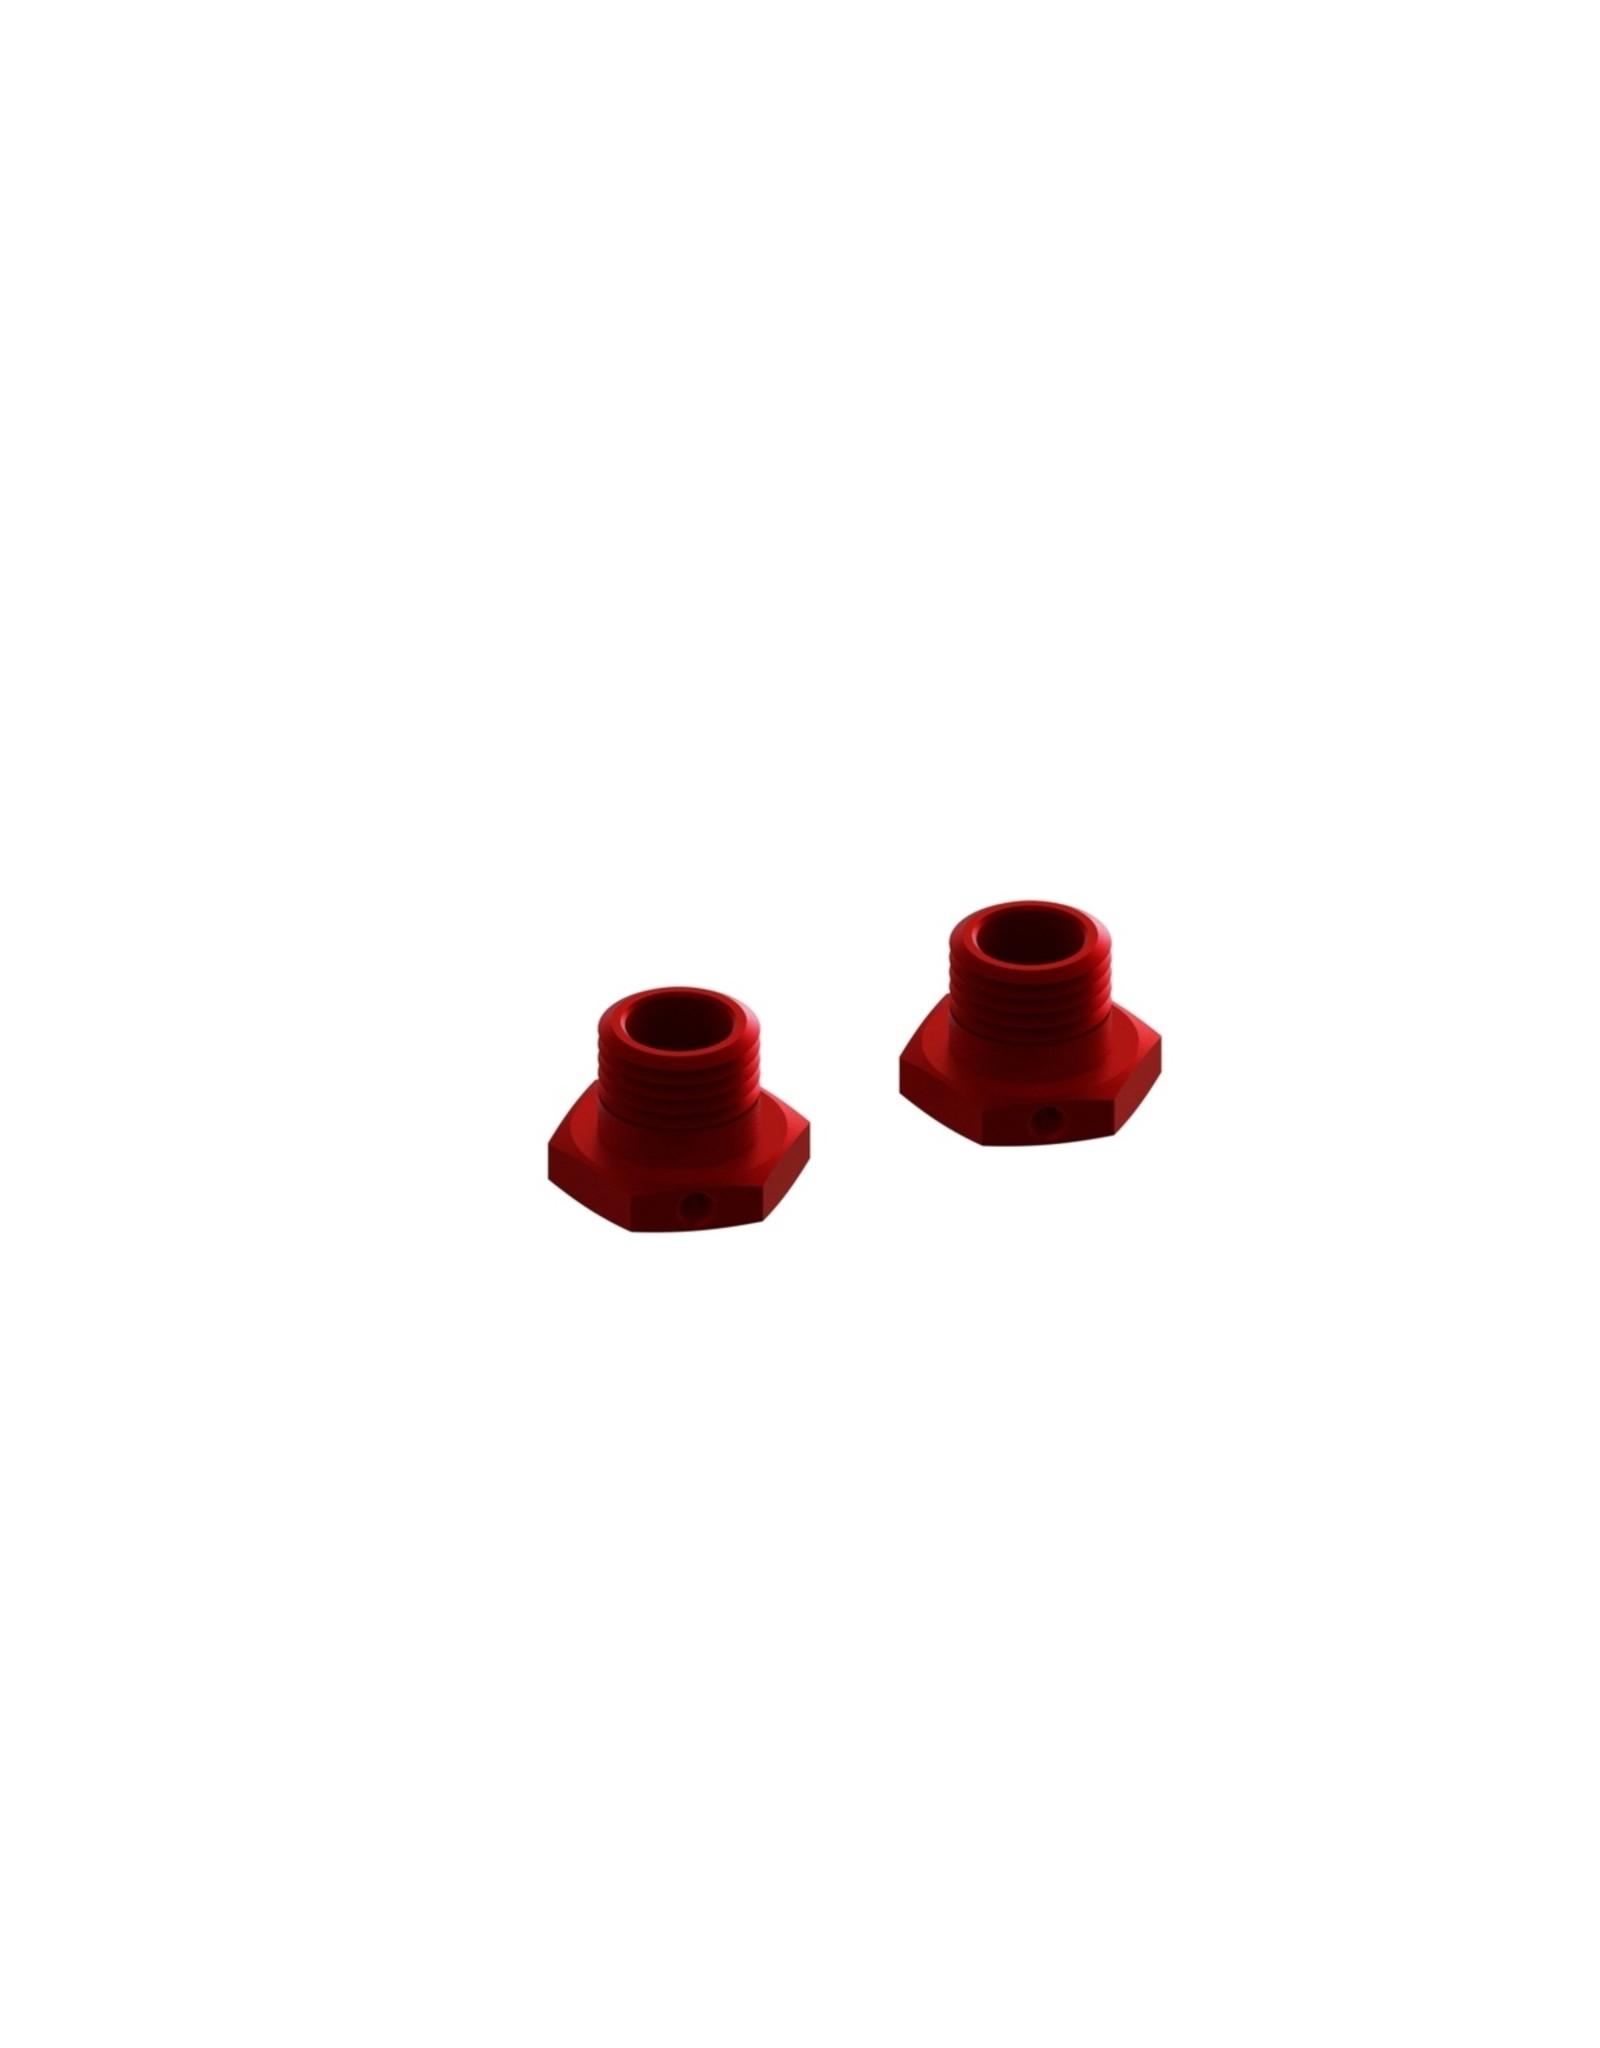 Arrma AR310447 - Aluminum Wheel Hex 17mm/13.6mm Thick - Red